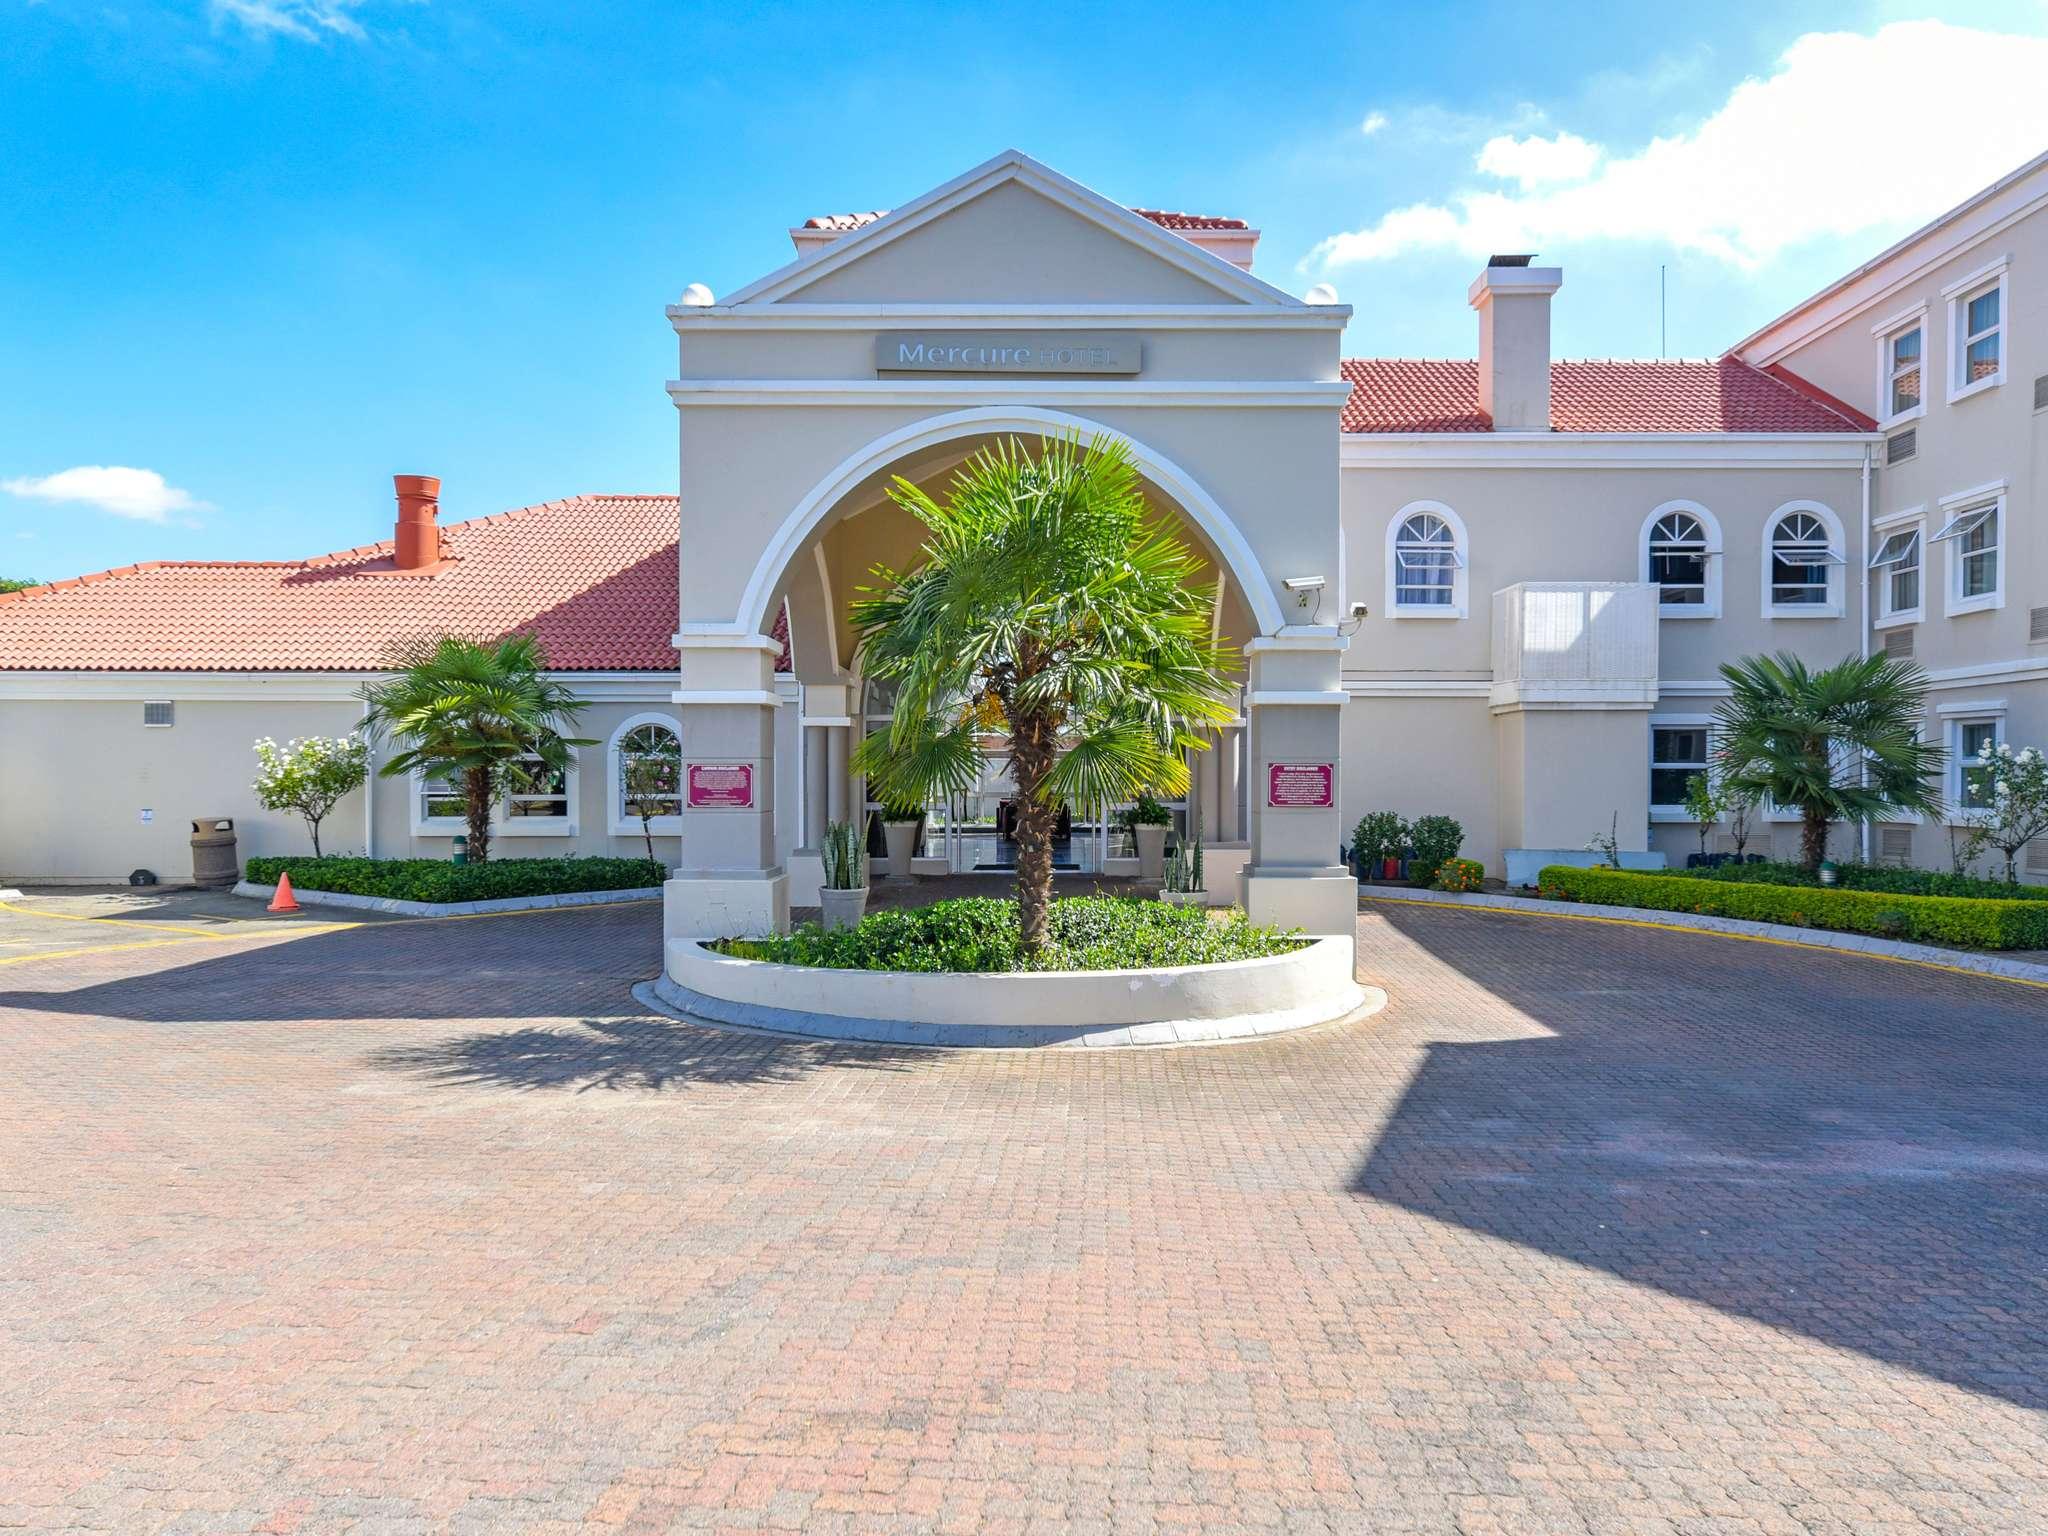 Hotel – Mercure Johannesburg Randburg Hotel